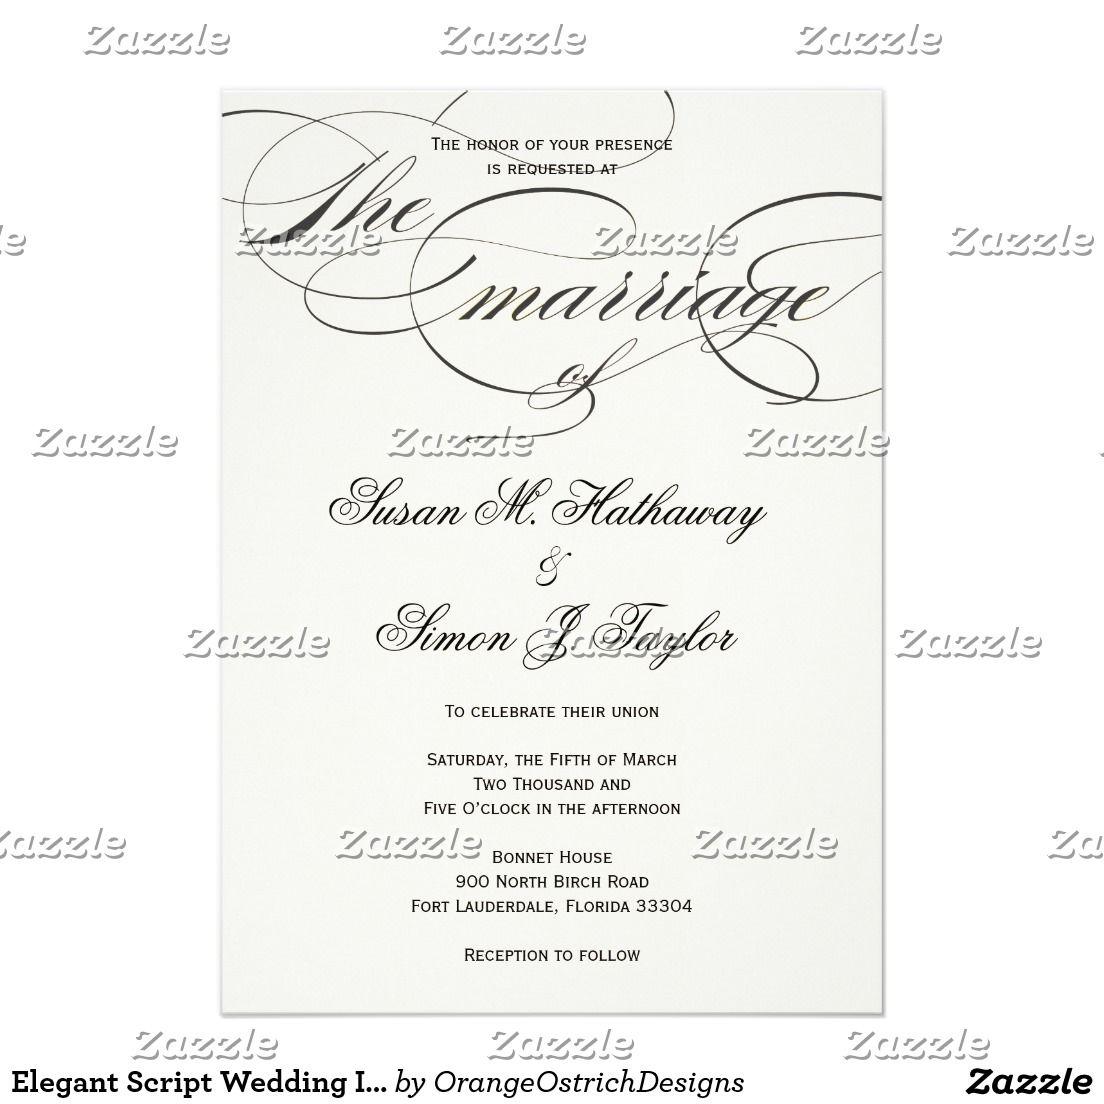 Elegant Script Wedding Invitation - BlackOff White